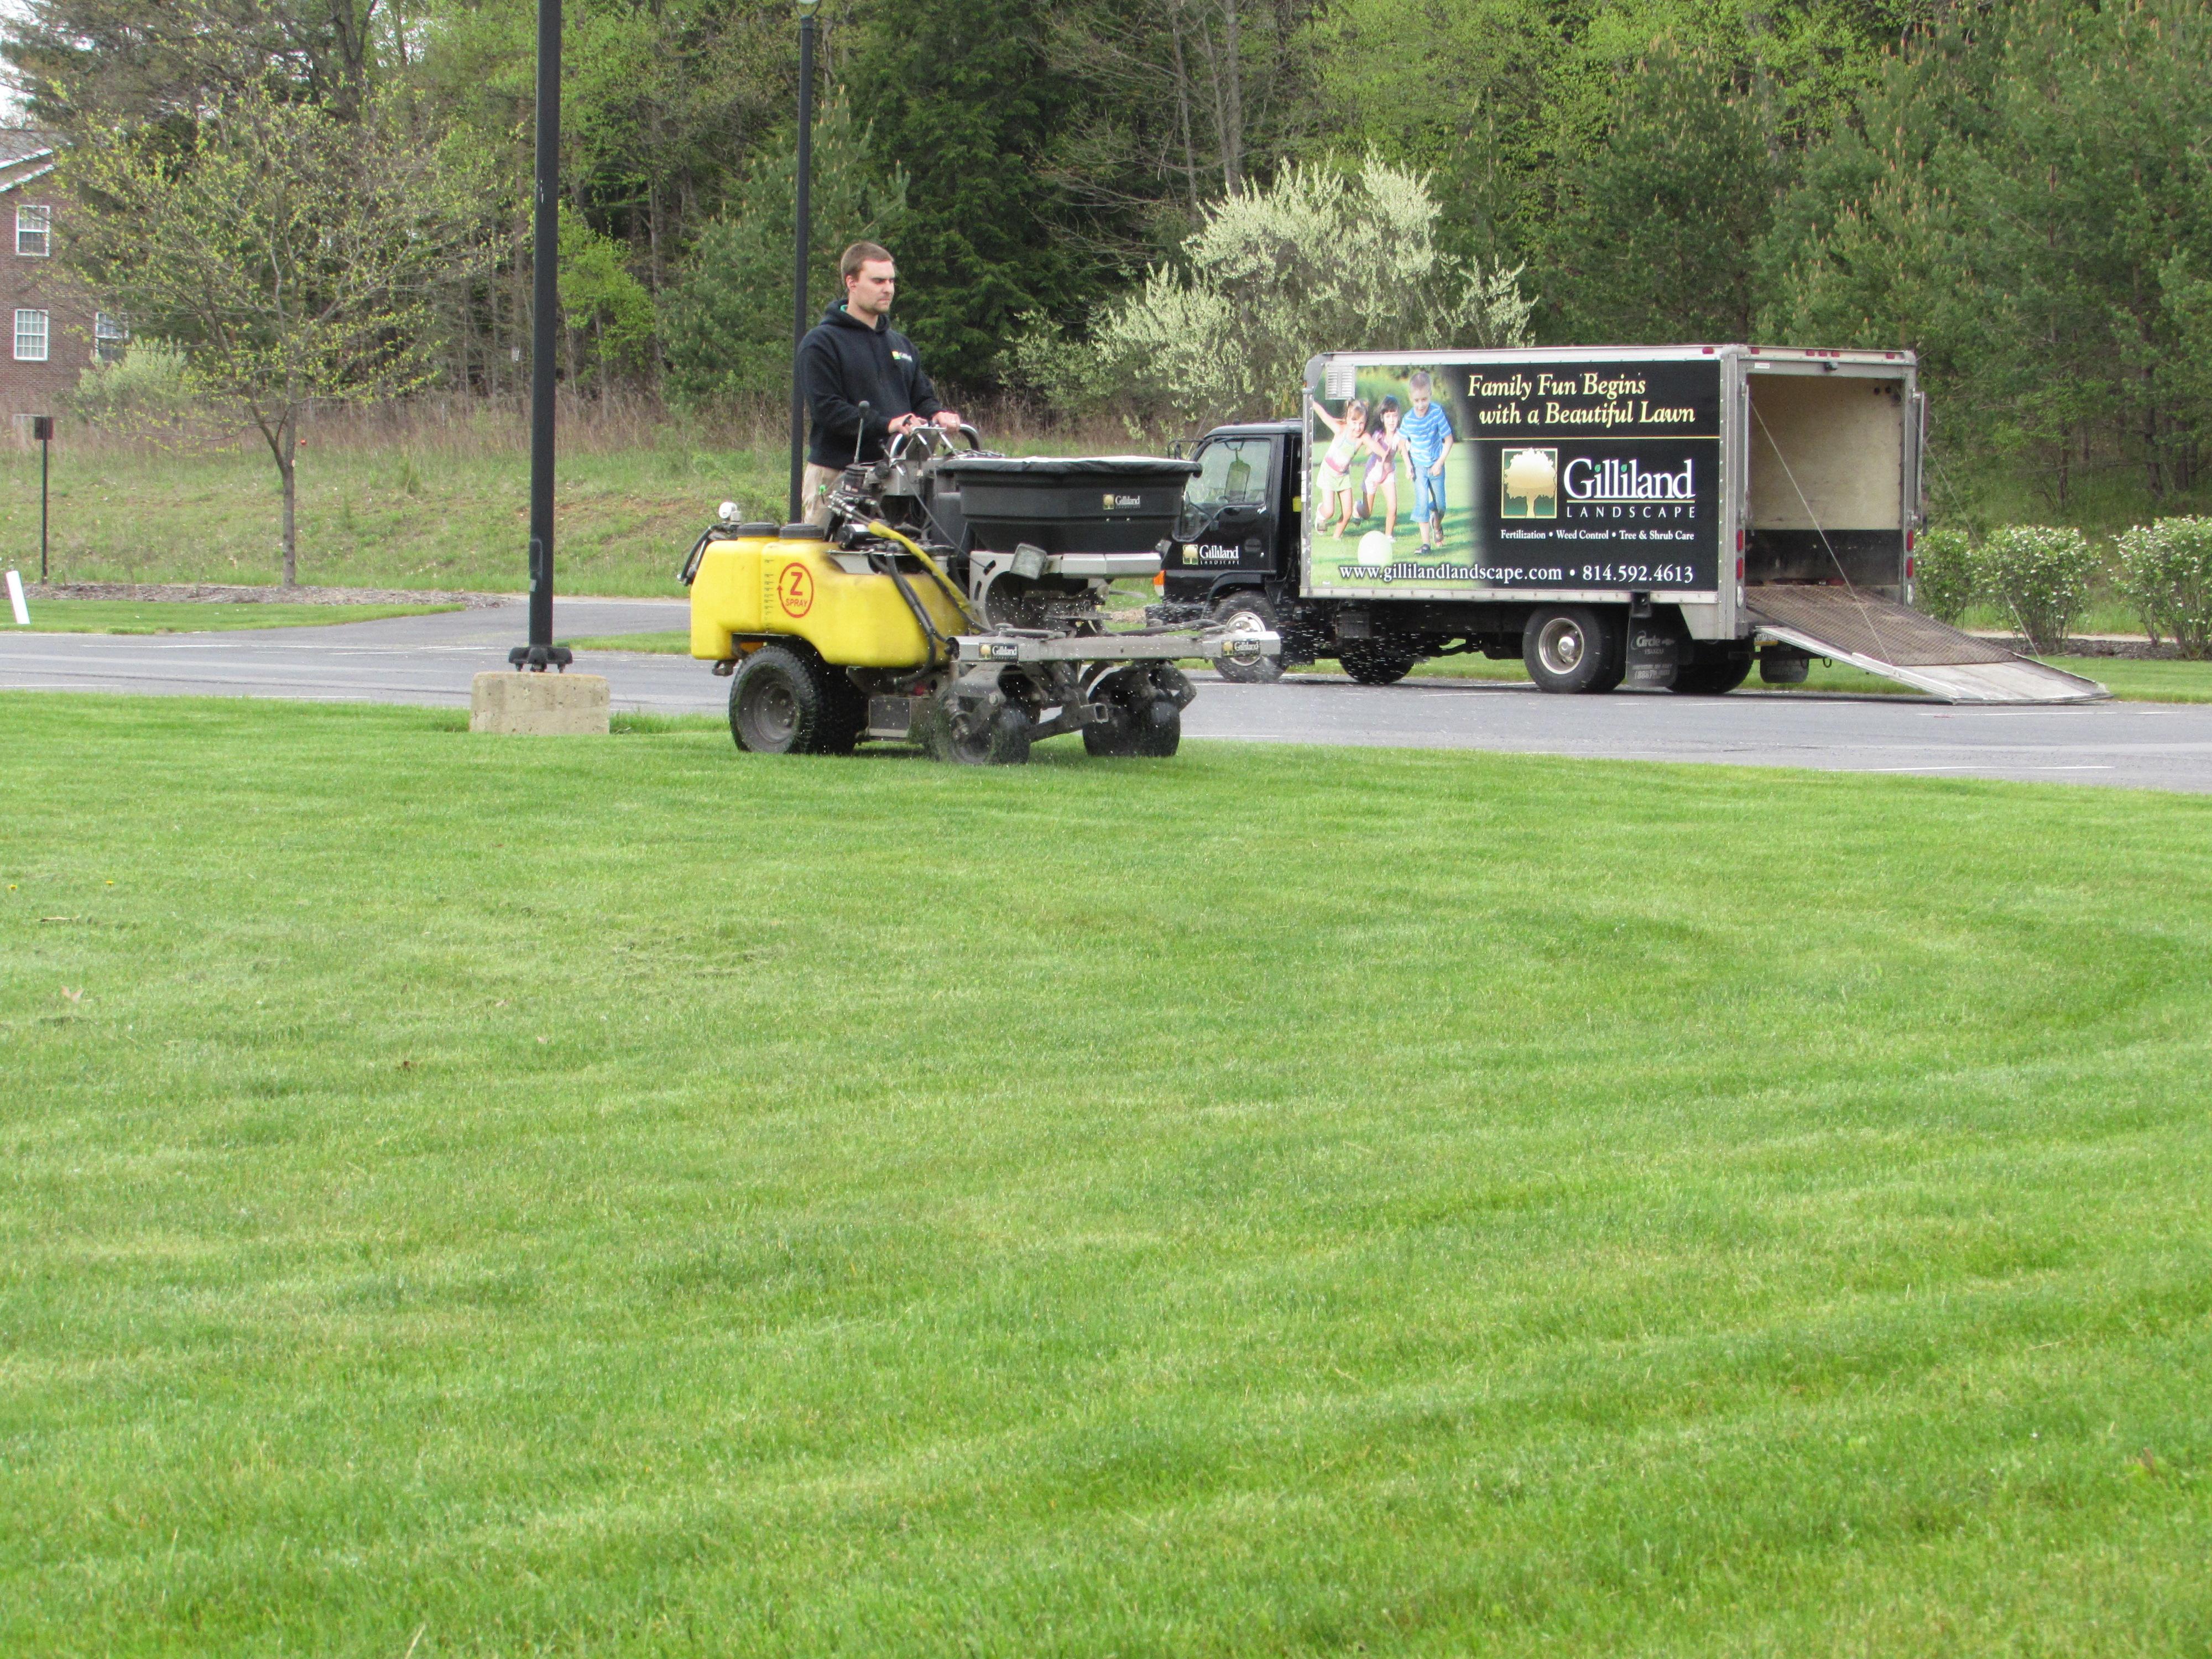 Gilliland landscape lawn care fertilization for Garden equipment deals